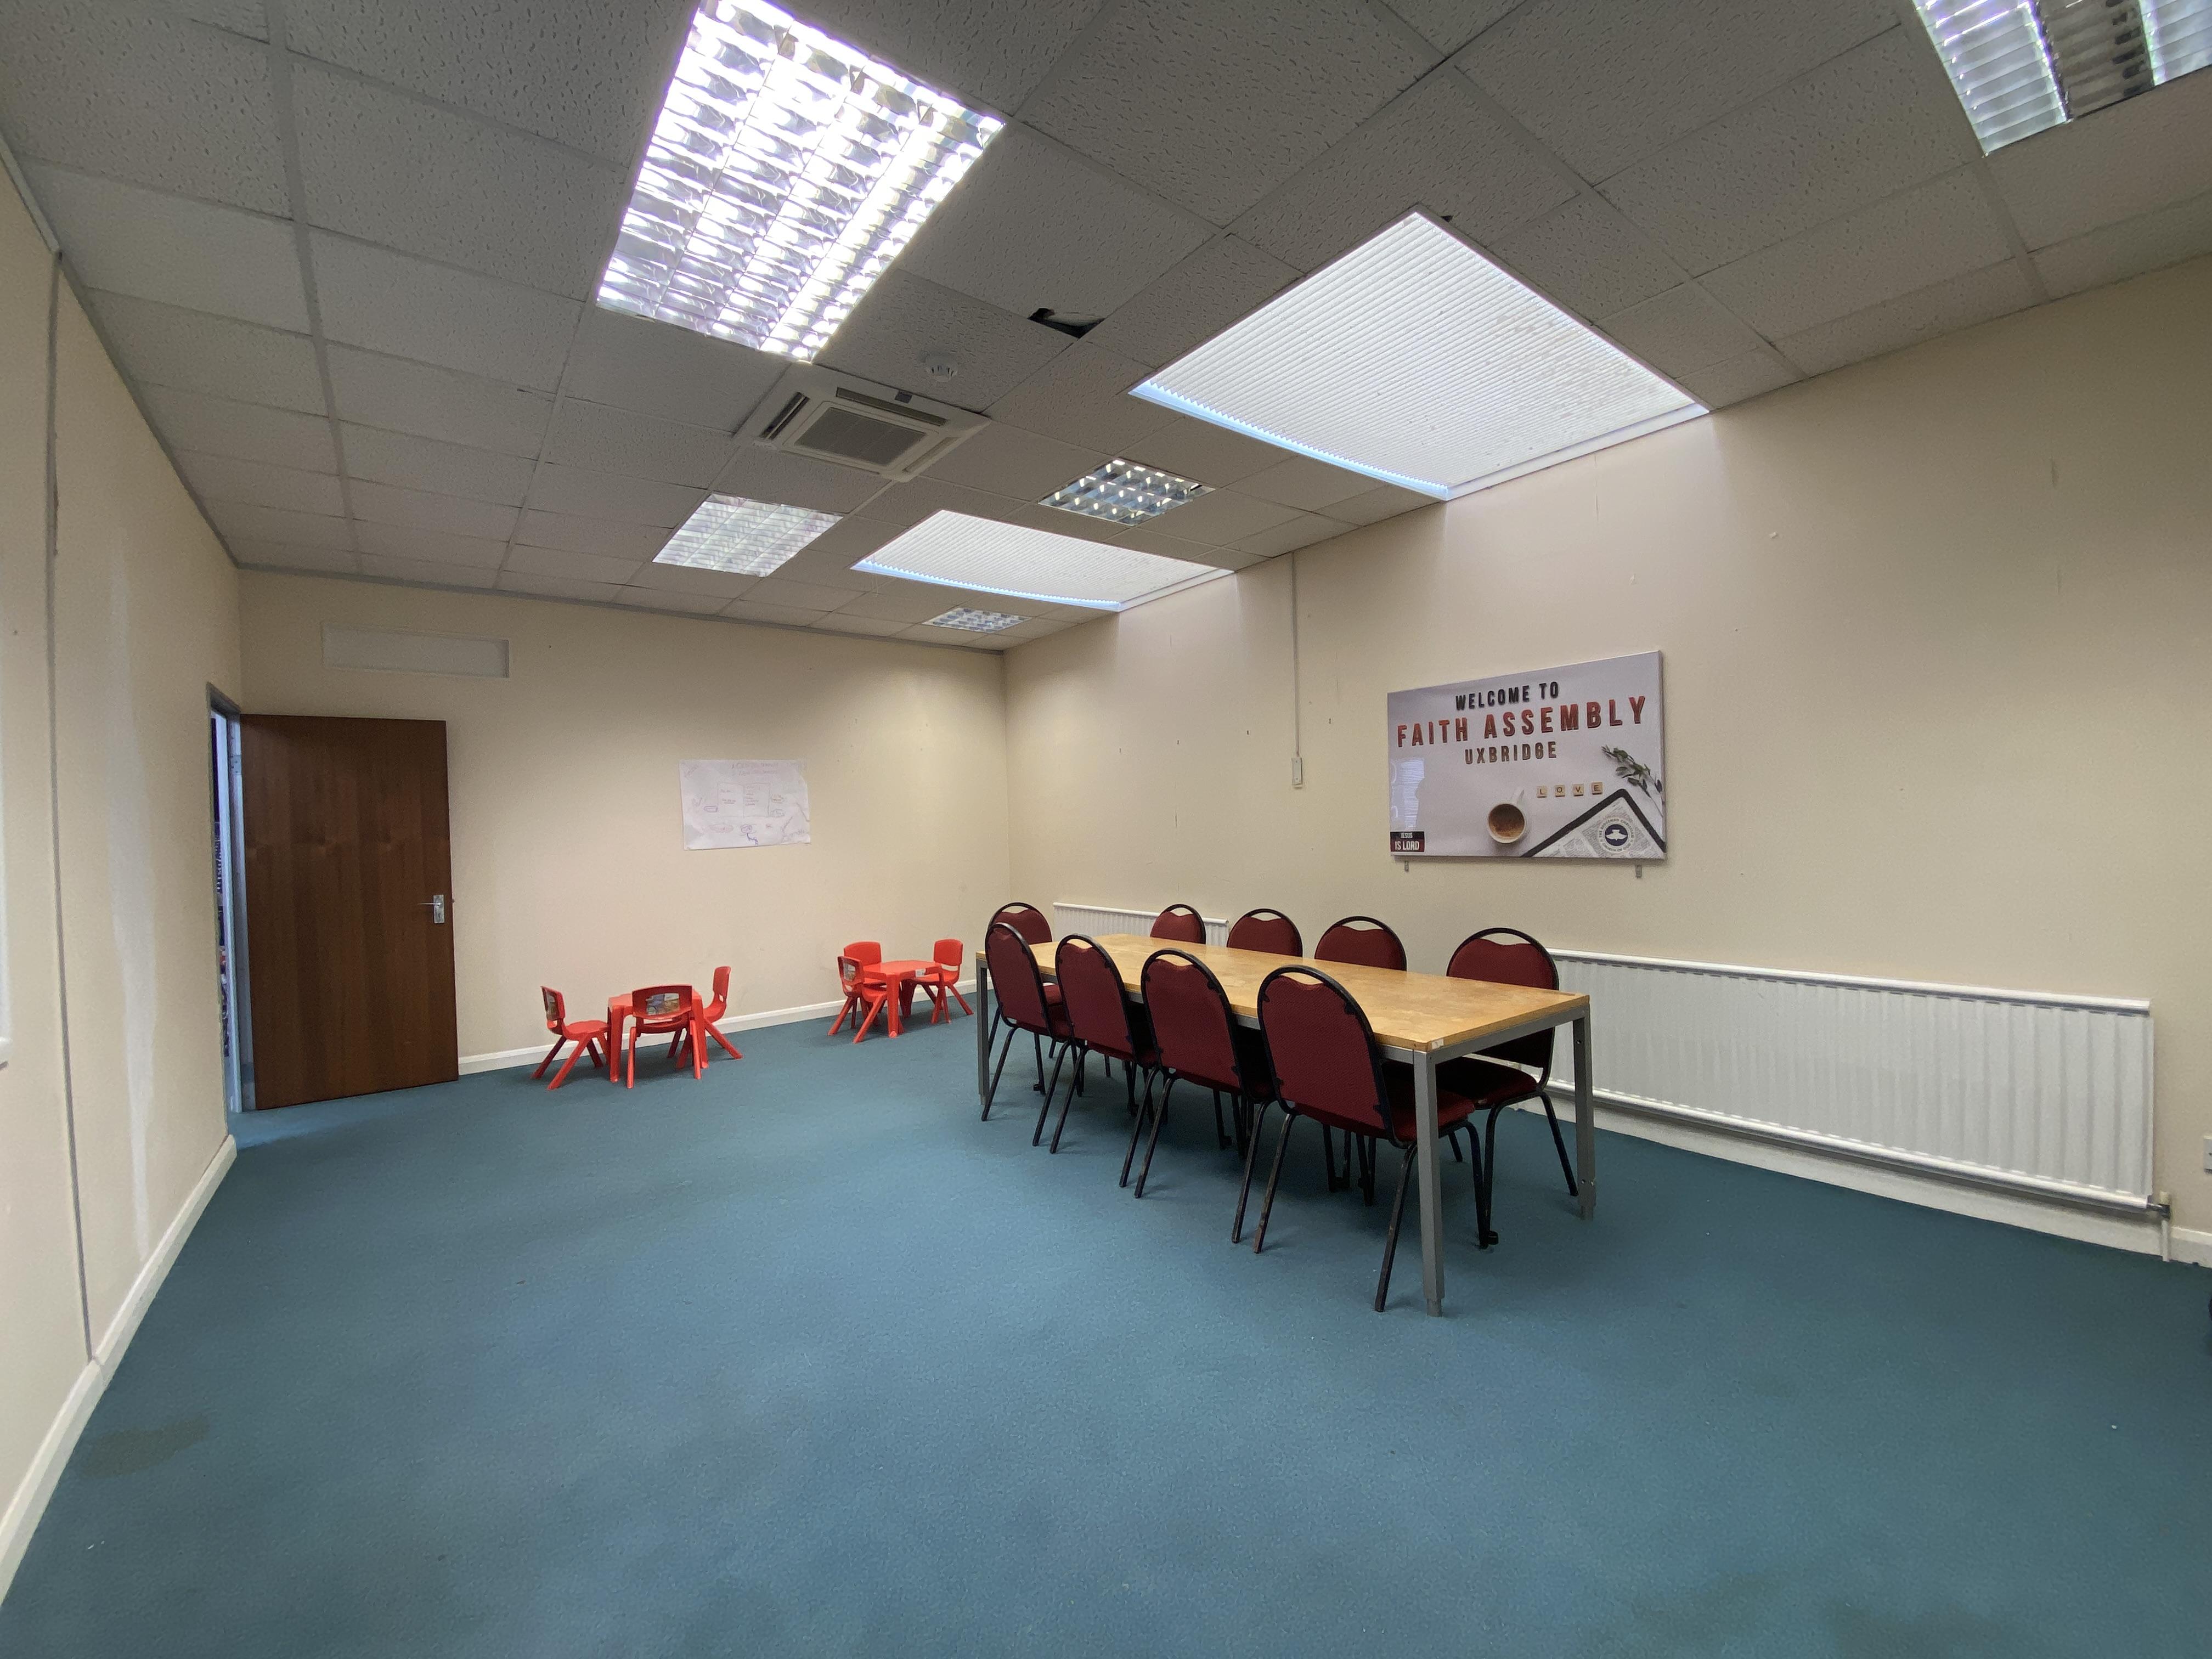 Faith Assembly Function Room